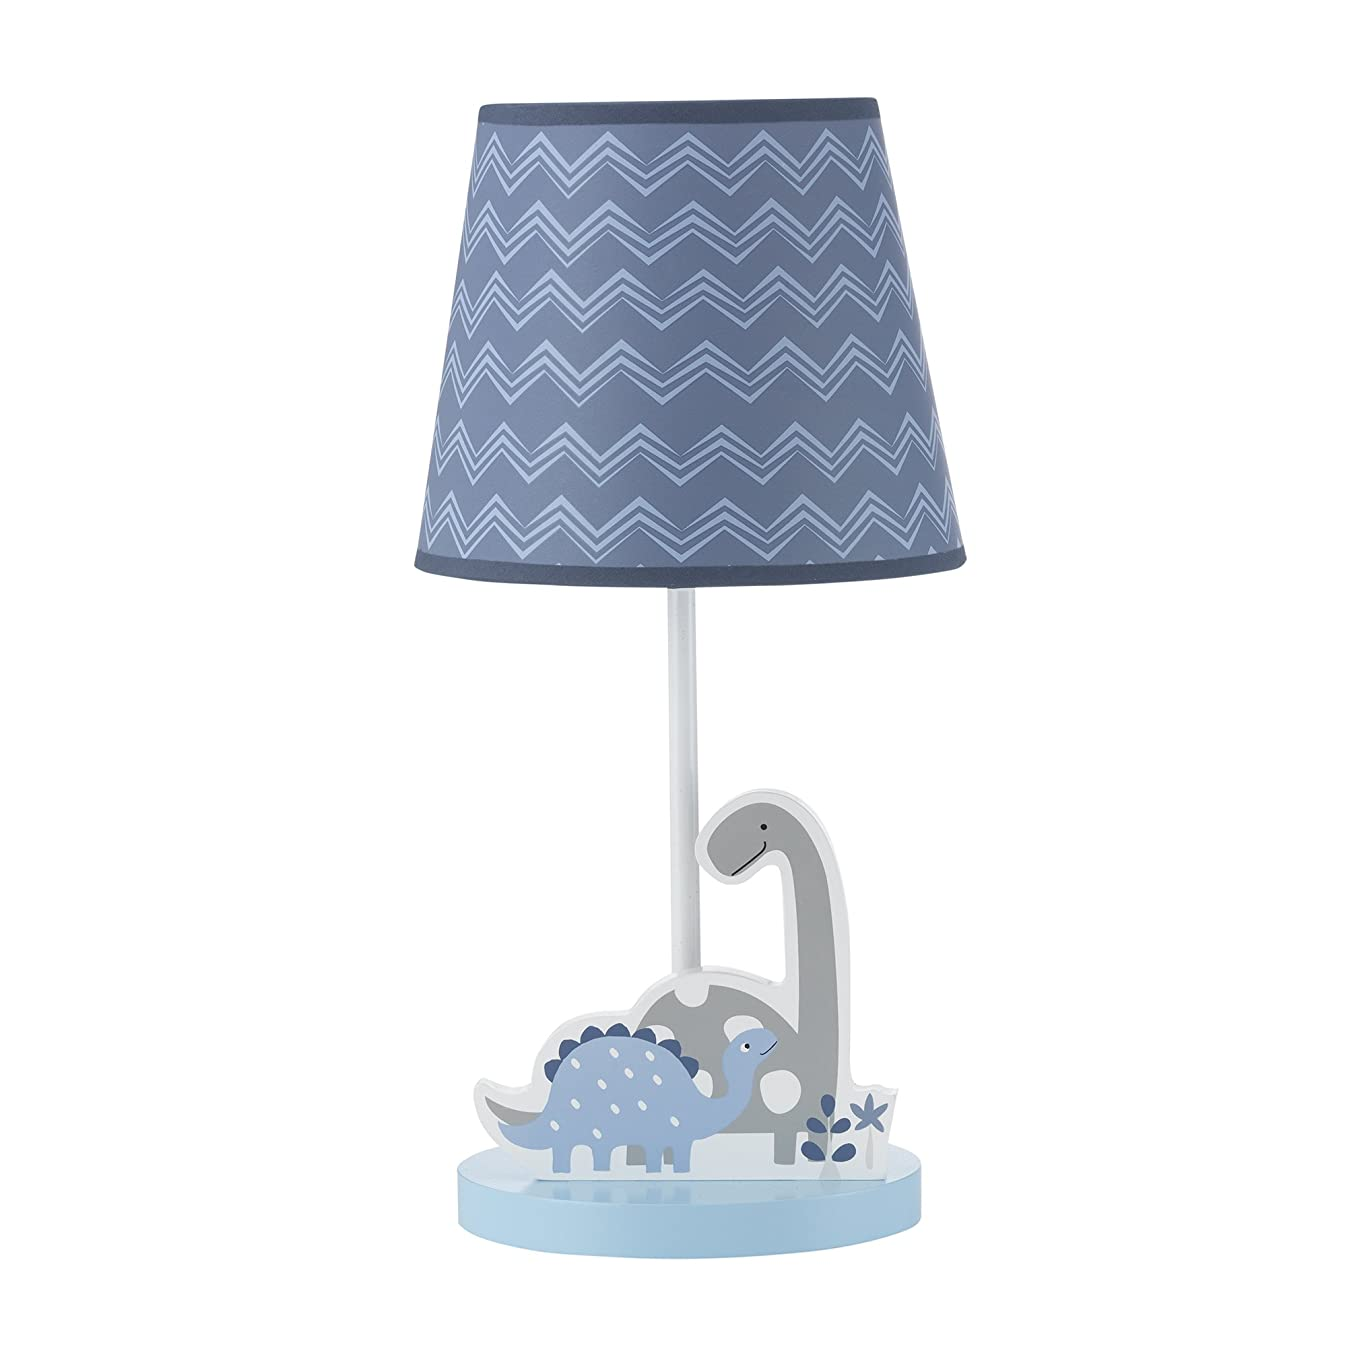 Bedtime Originals Roar Dinosaur Lamp with Shade & Bulb, Blue/Gray